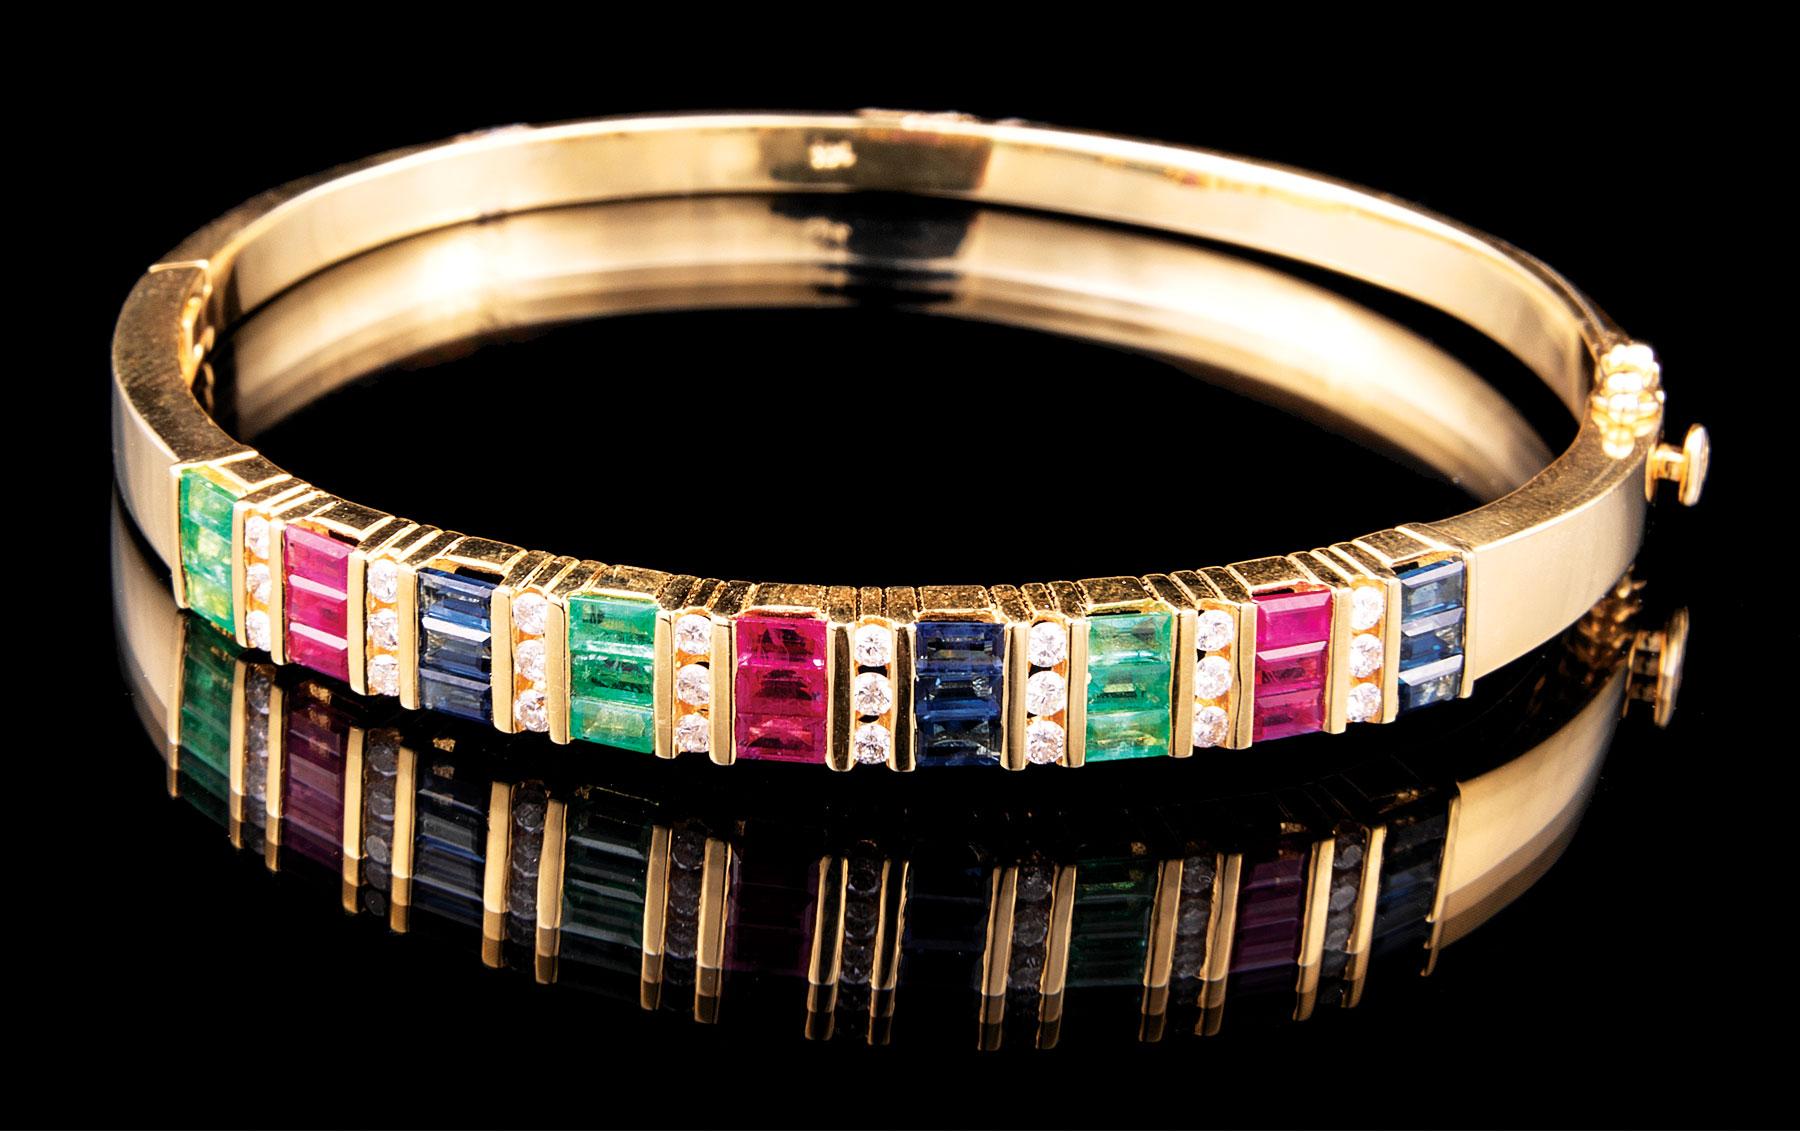 Lot 618 - 14 kt. Yellow Gold, Emerald, Ruby, Blue Sapphire and Diamond Bangle Bracelet , 9 each channel set,